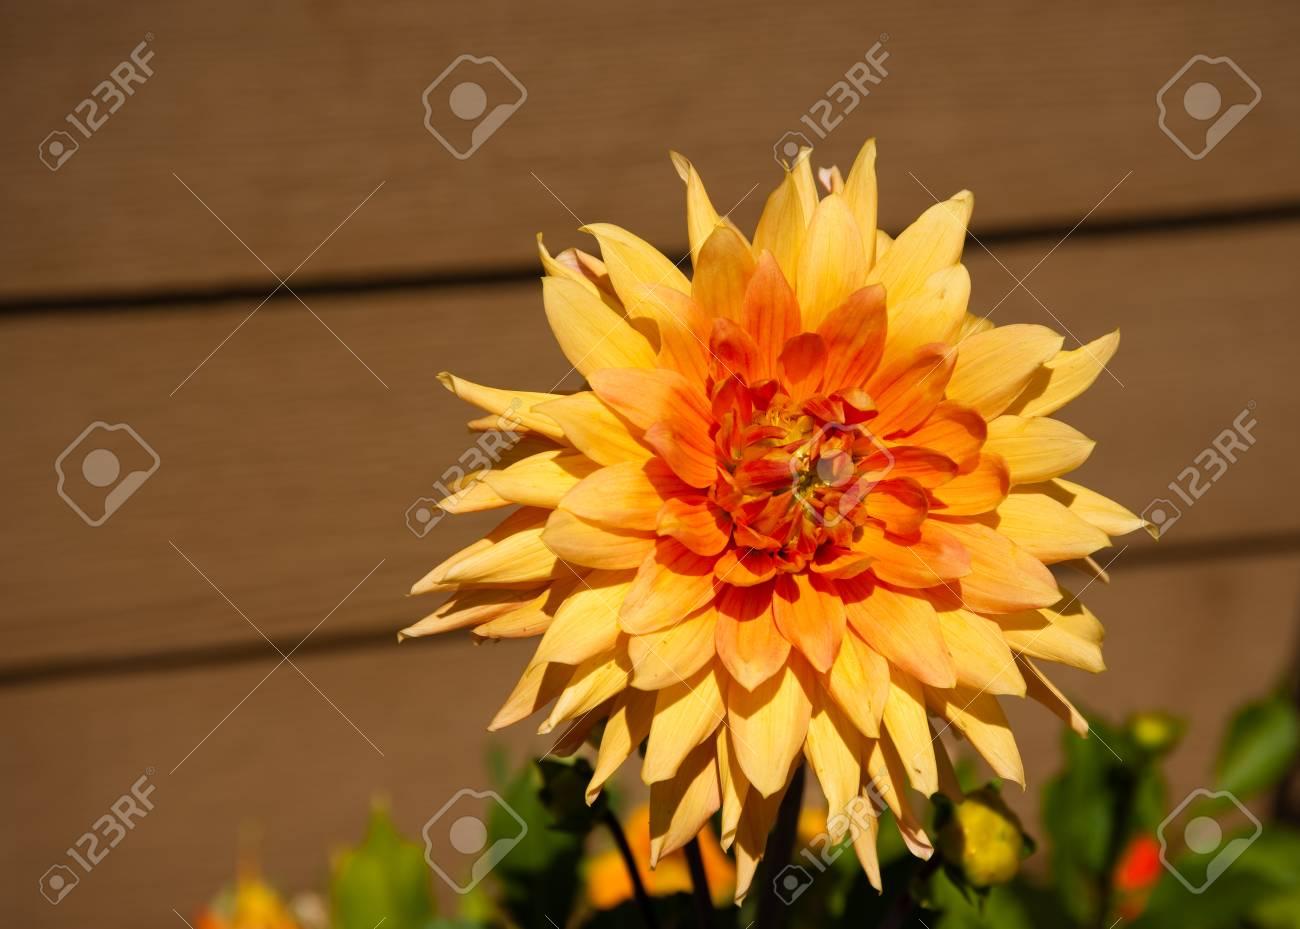 Sunlit flower in a garden - 89407589